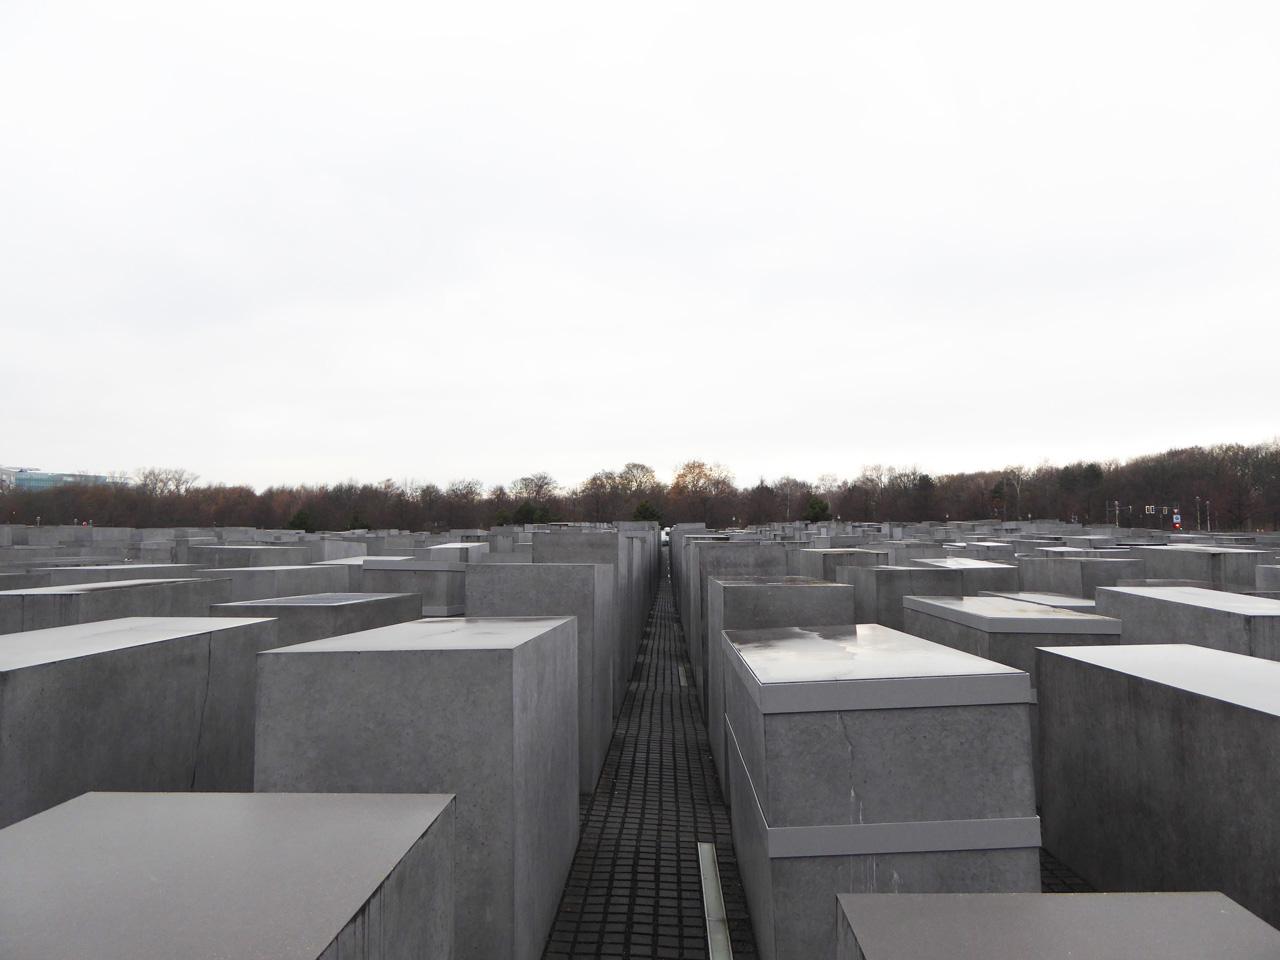 holocaust-Manhal-Eisenman-berlin Memorial to the Murdered Jews of Europe - Peter Eisenman